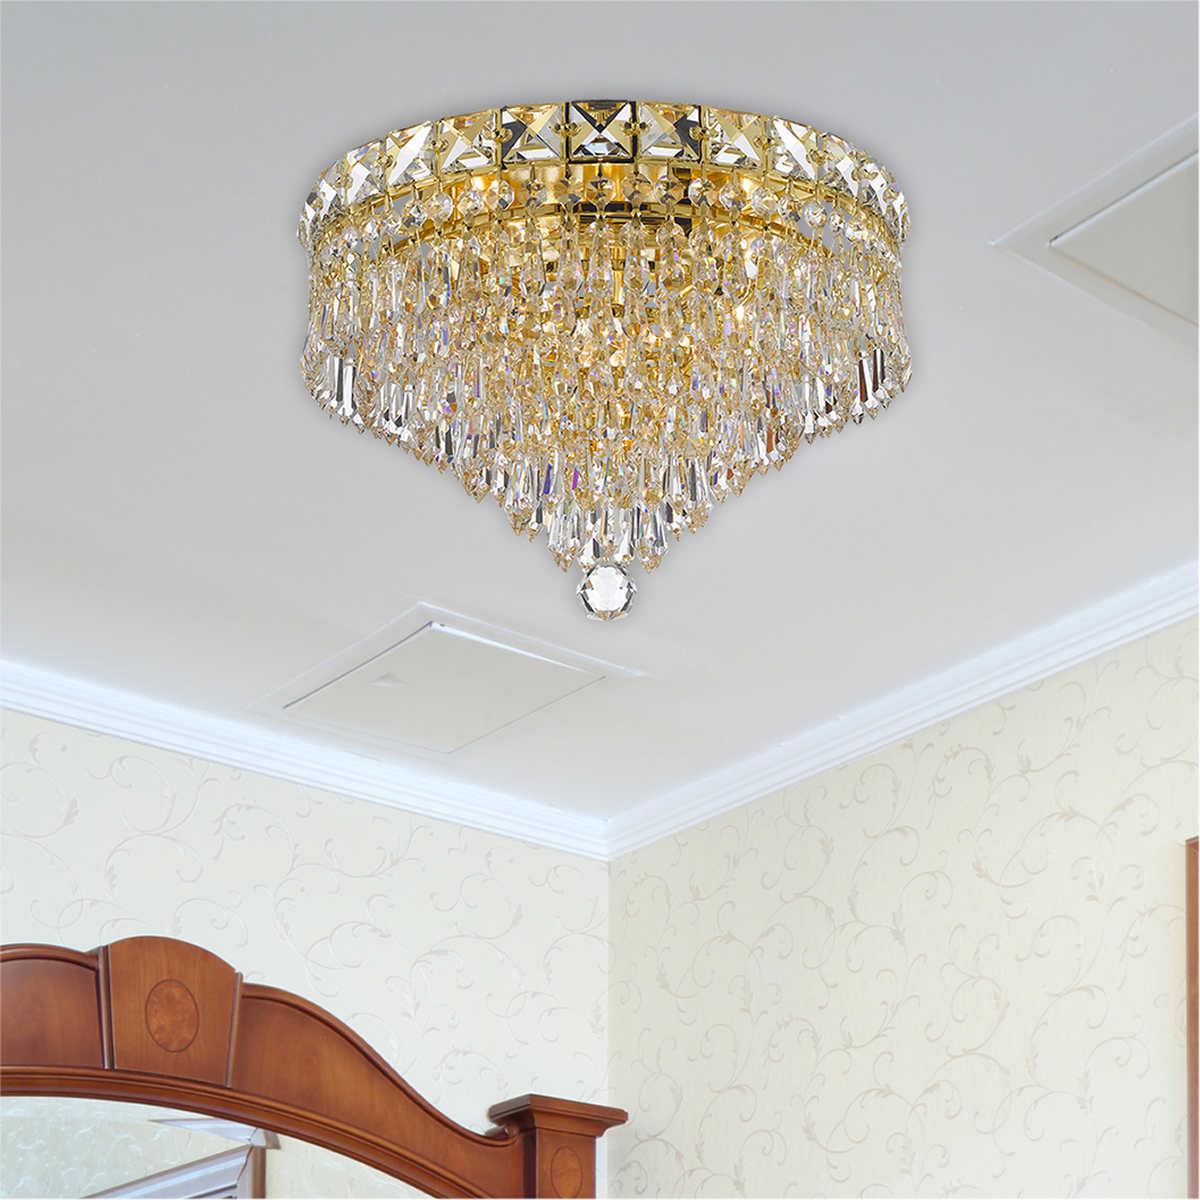 Lighting by pecaso luminaire flush mount chandelier 3 lights click to zoom arubaitofo Gallery